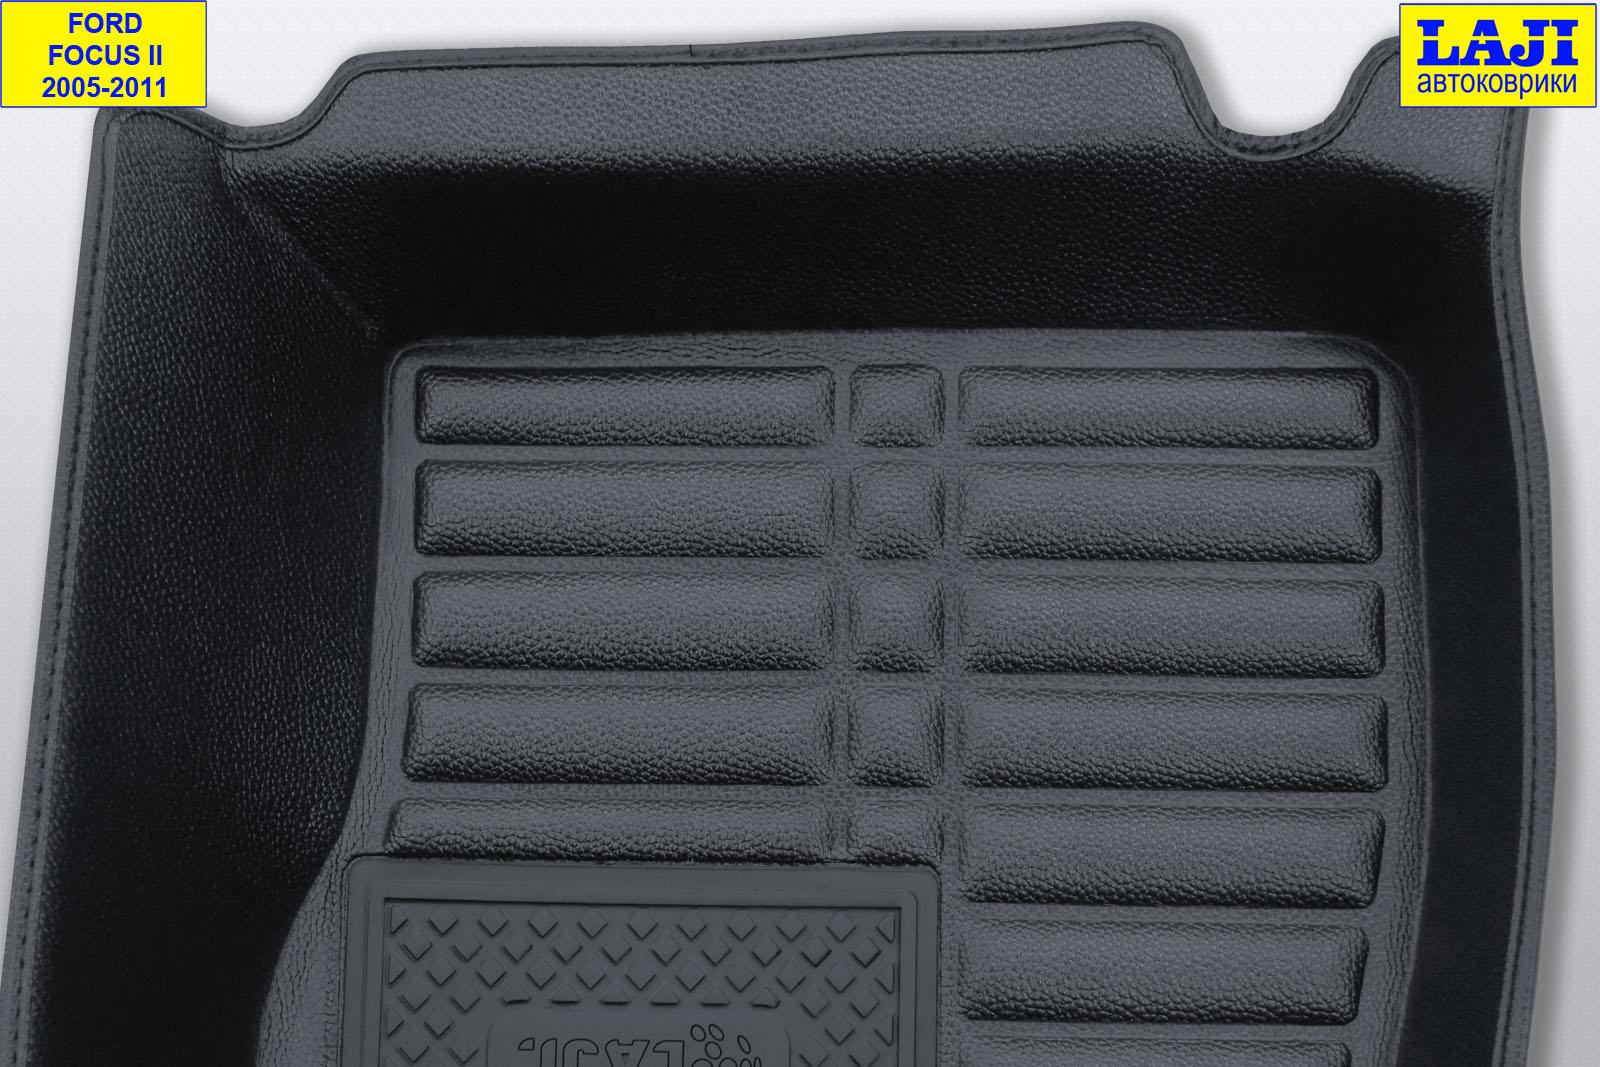 5D коврики в салон Ford Focus 2 2005-2011 8